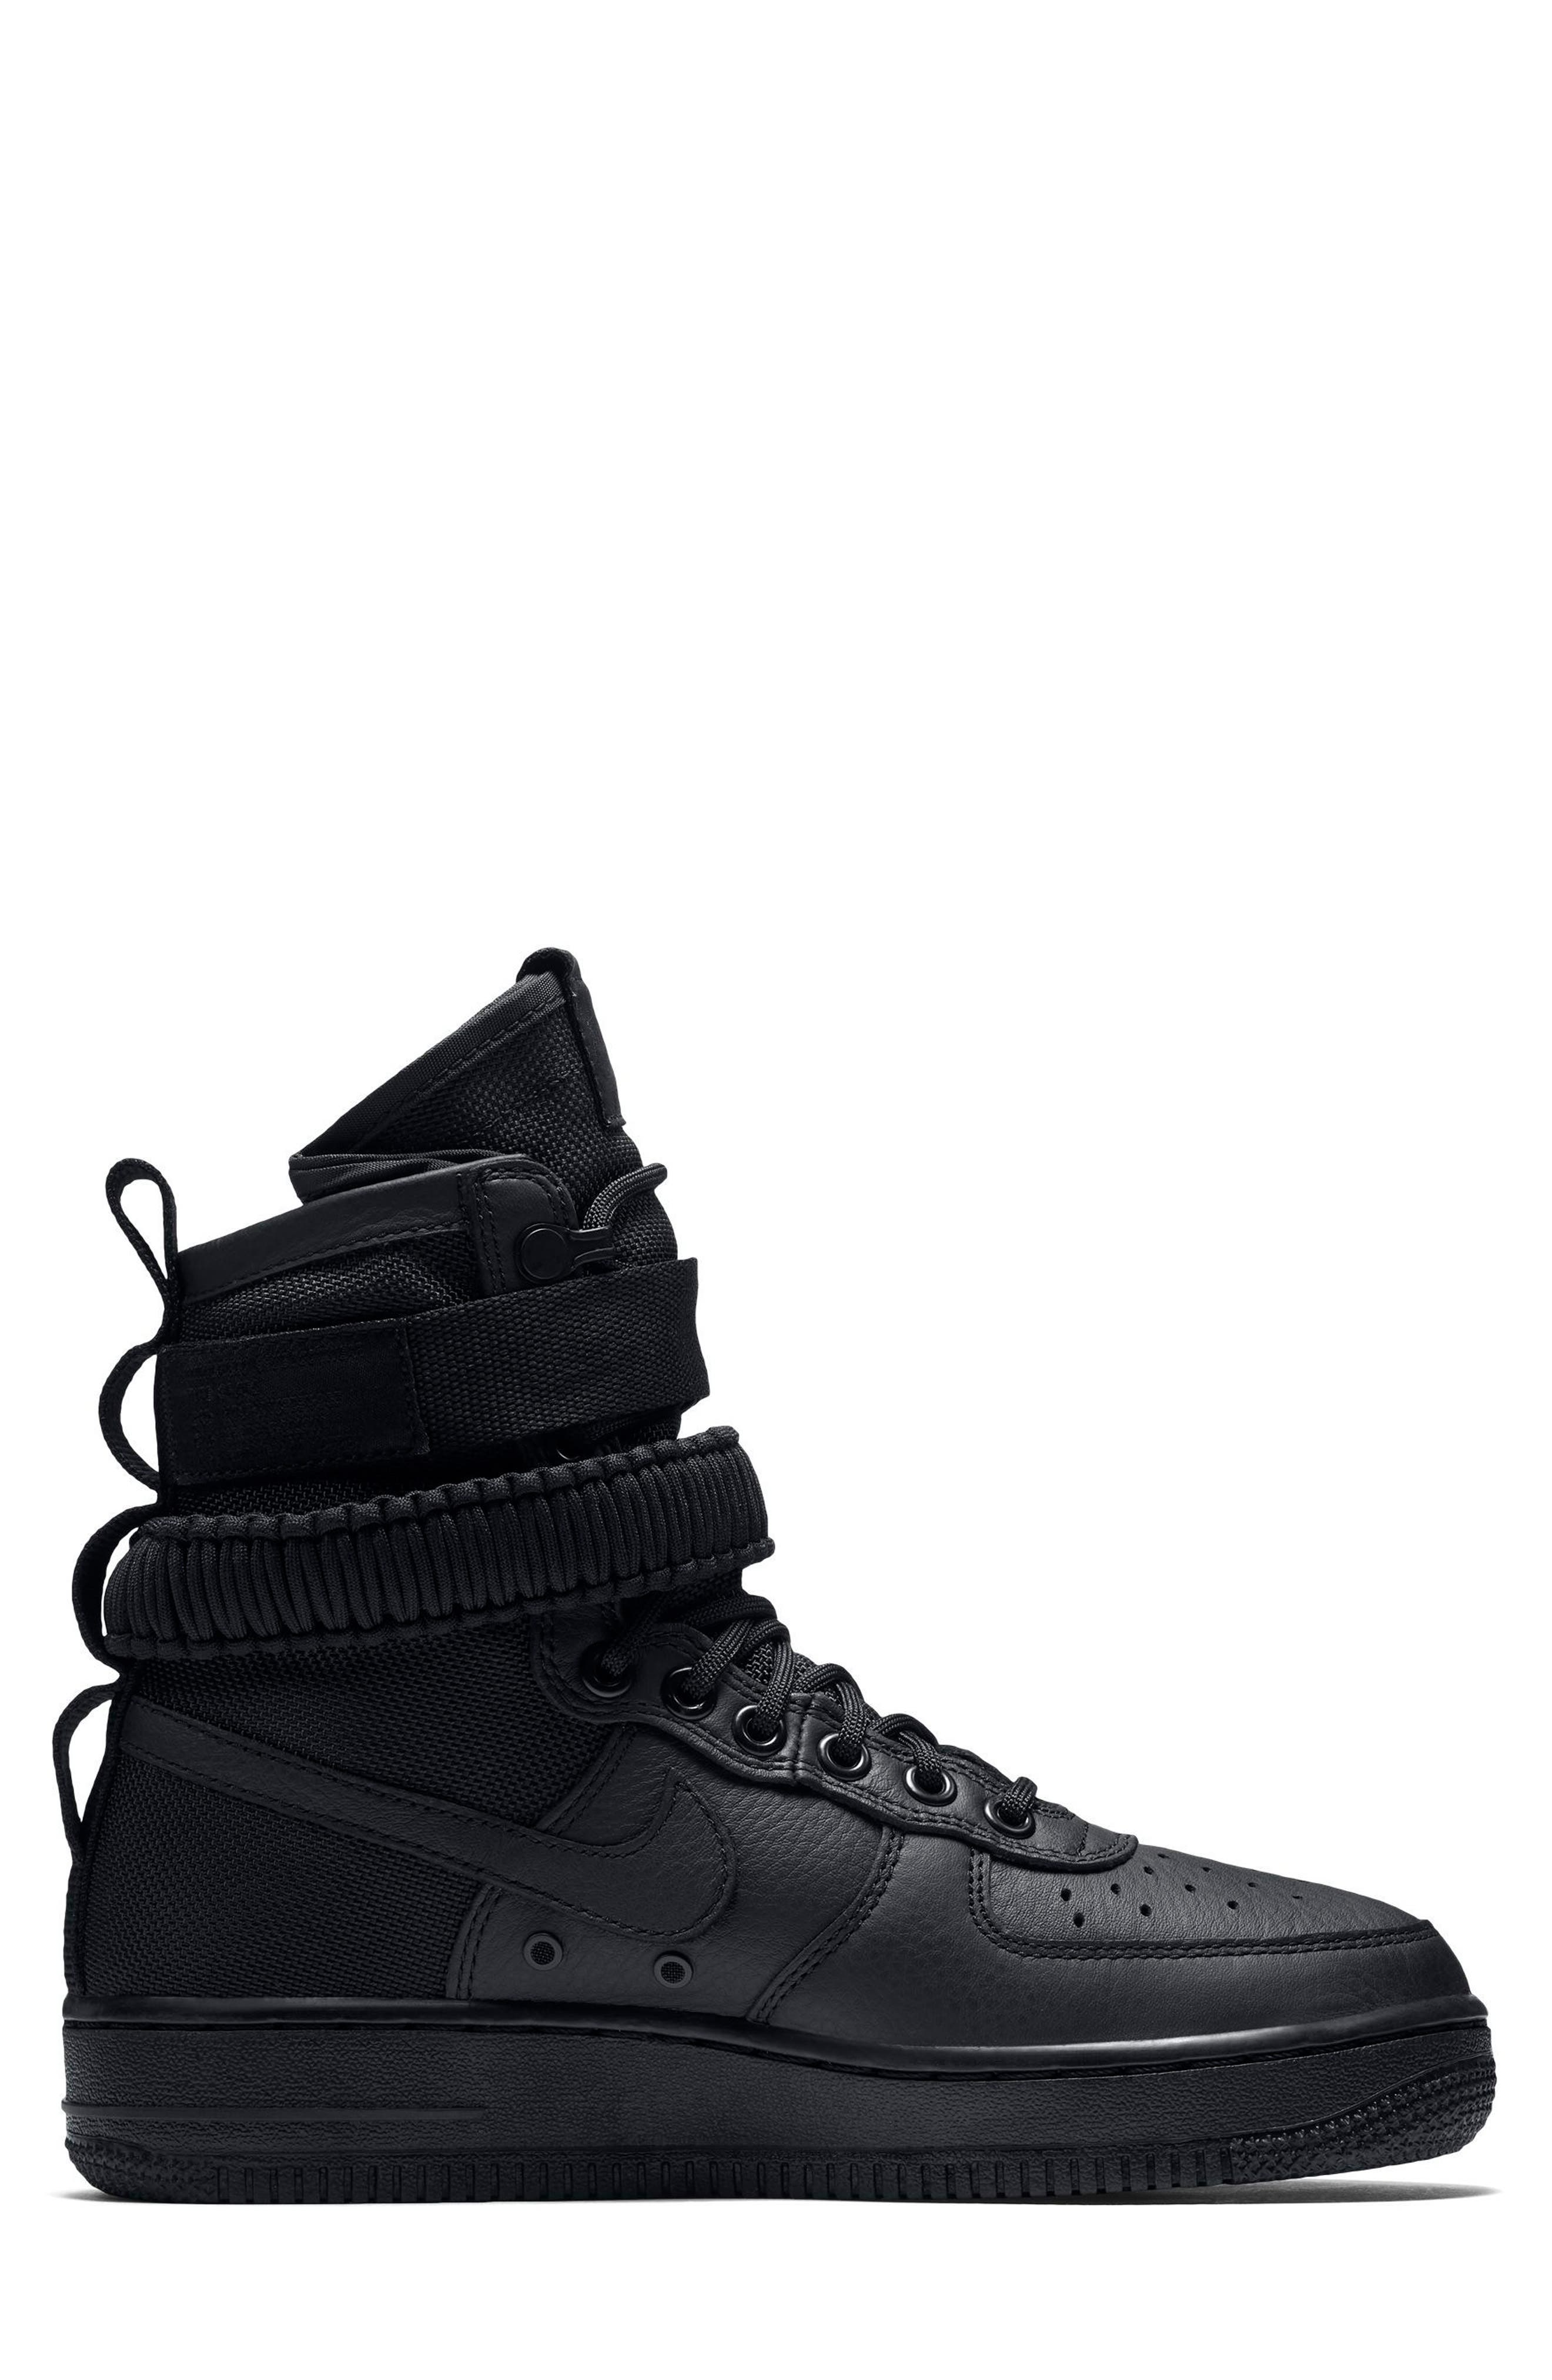 SF Air Force 1 High Top Sneaker,                             Alternate thumbnail 3, color,                             002